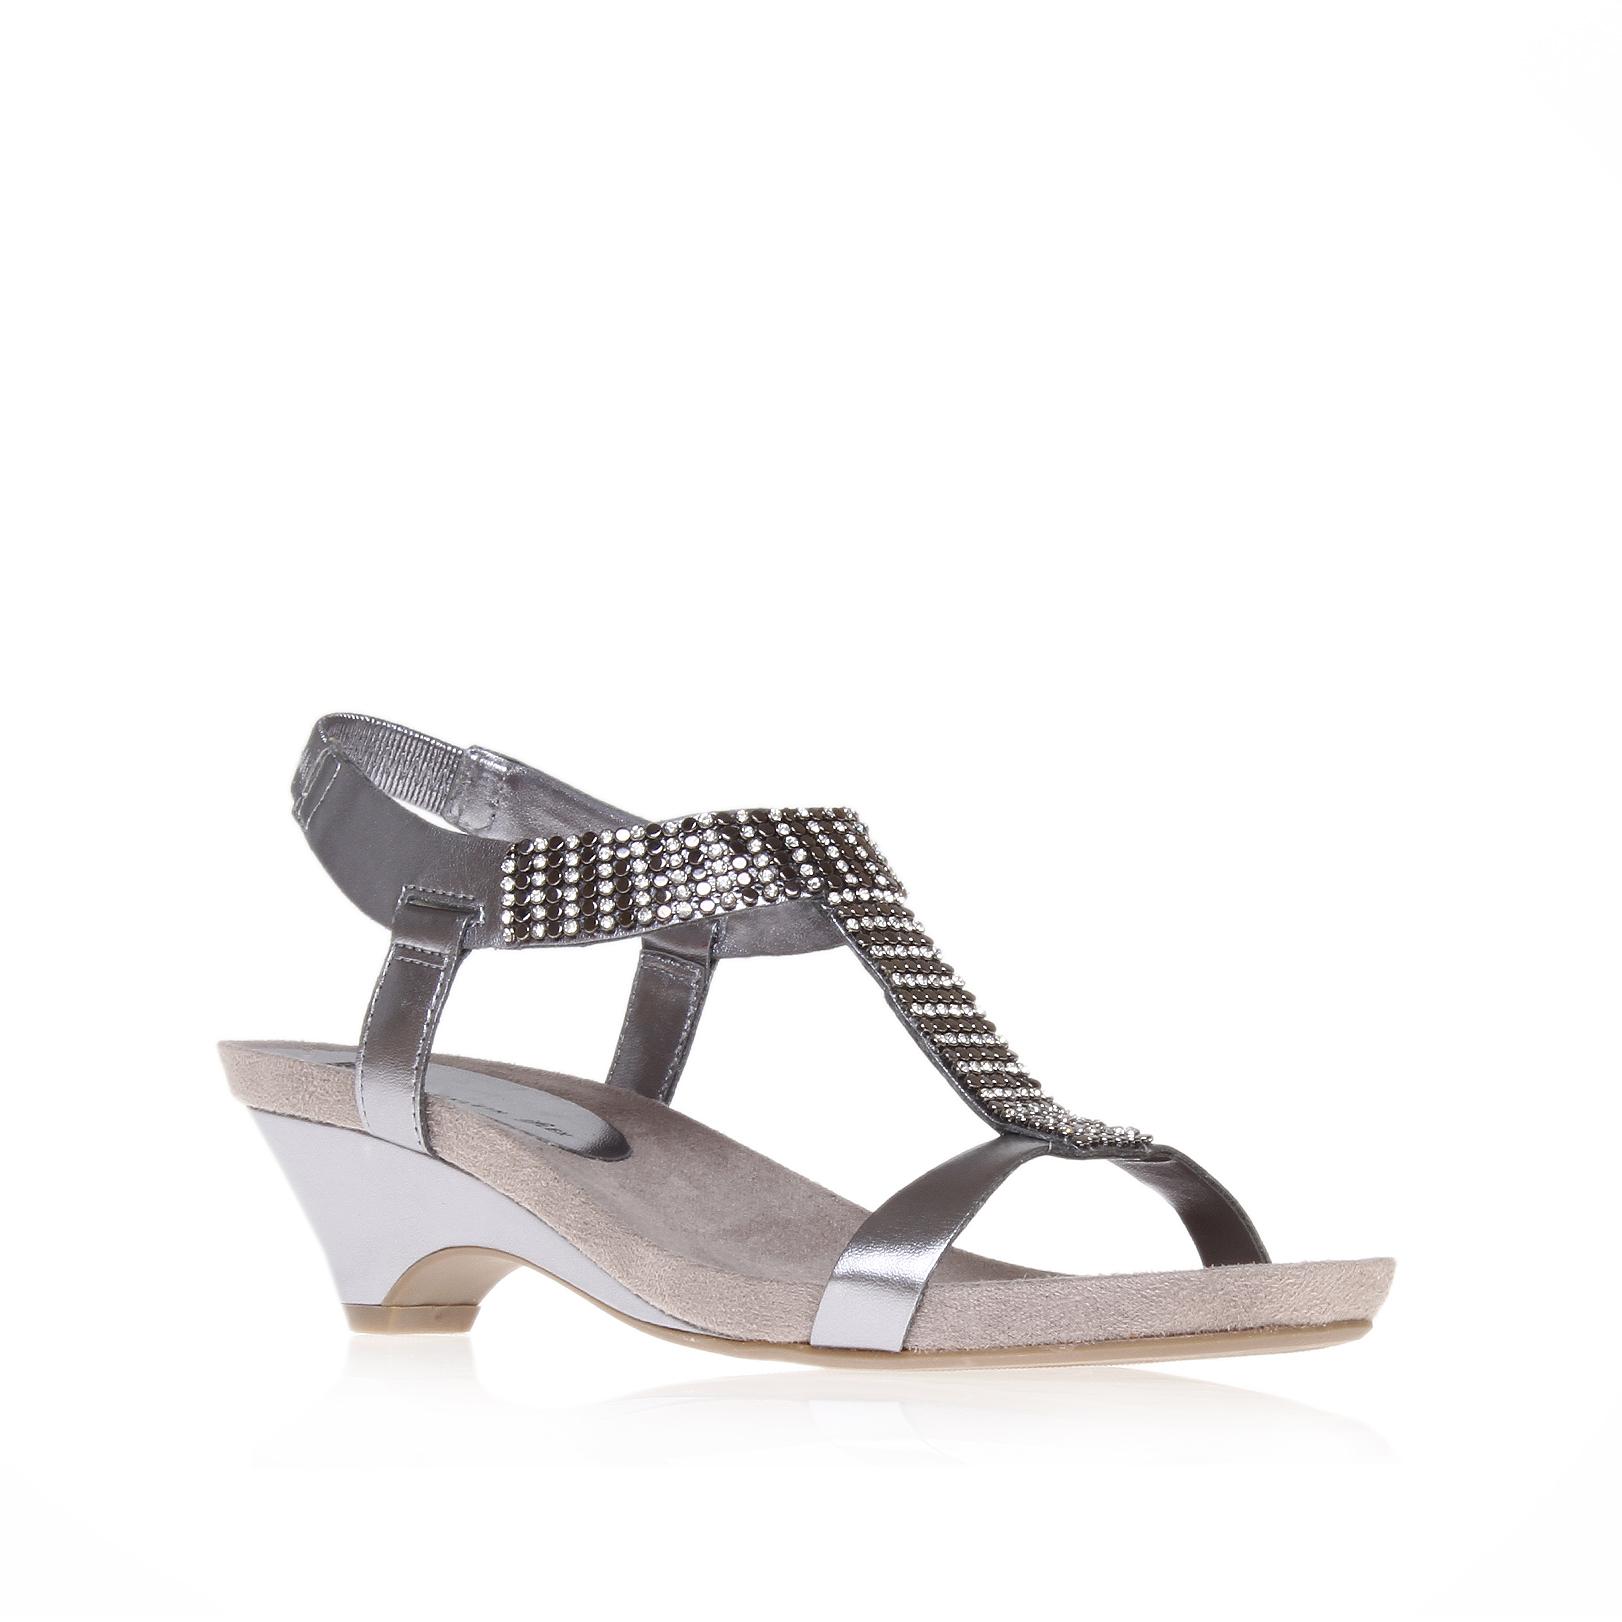 1789316637e TEALE Pewter mid heel gladiator sandals by ANNE KLEIN